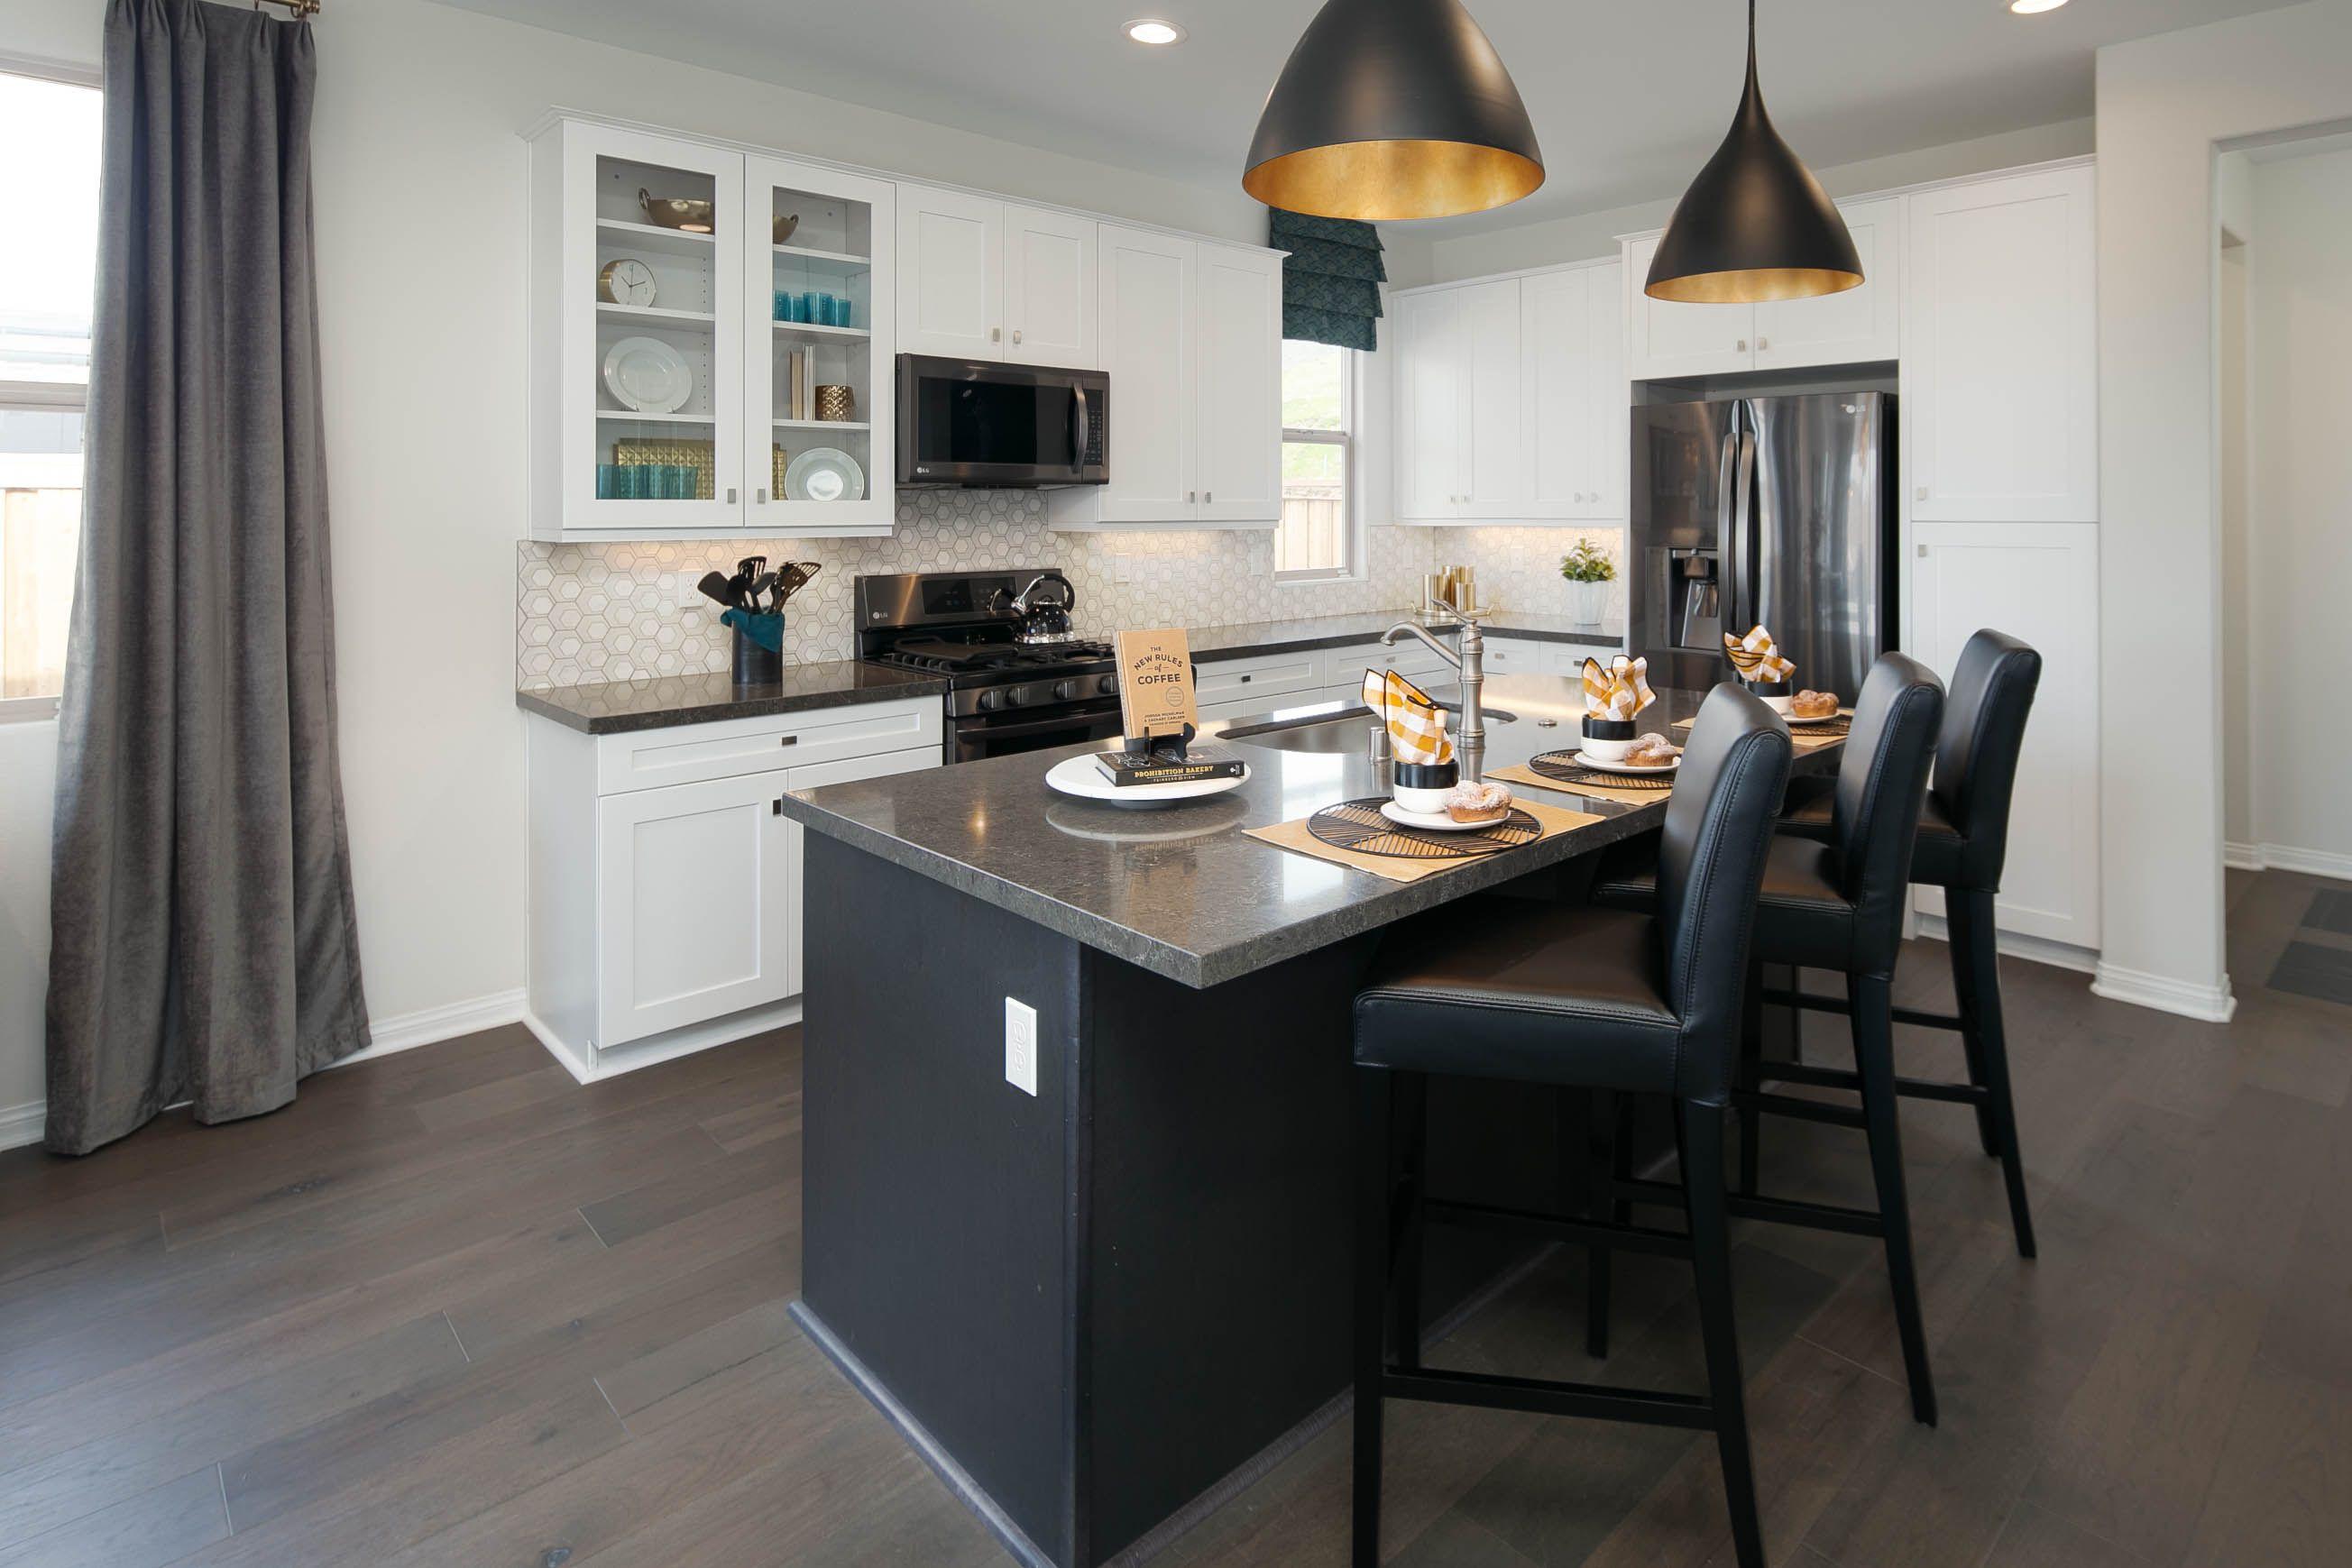 Kitchen-in-Residence One-at-Righetti-in-San Luis Obispo